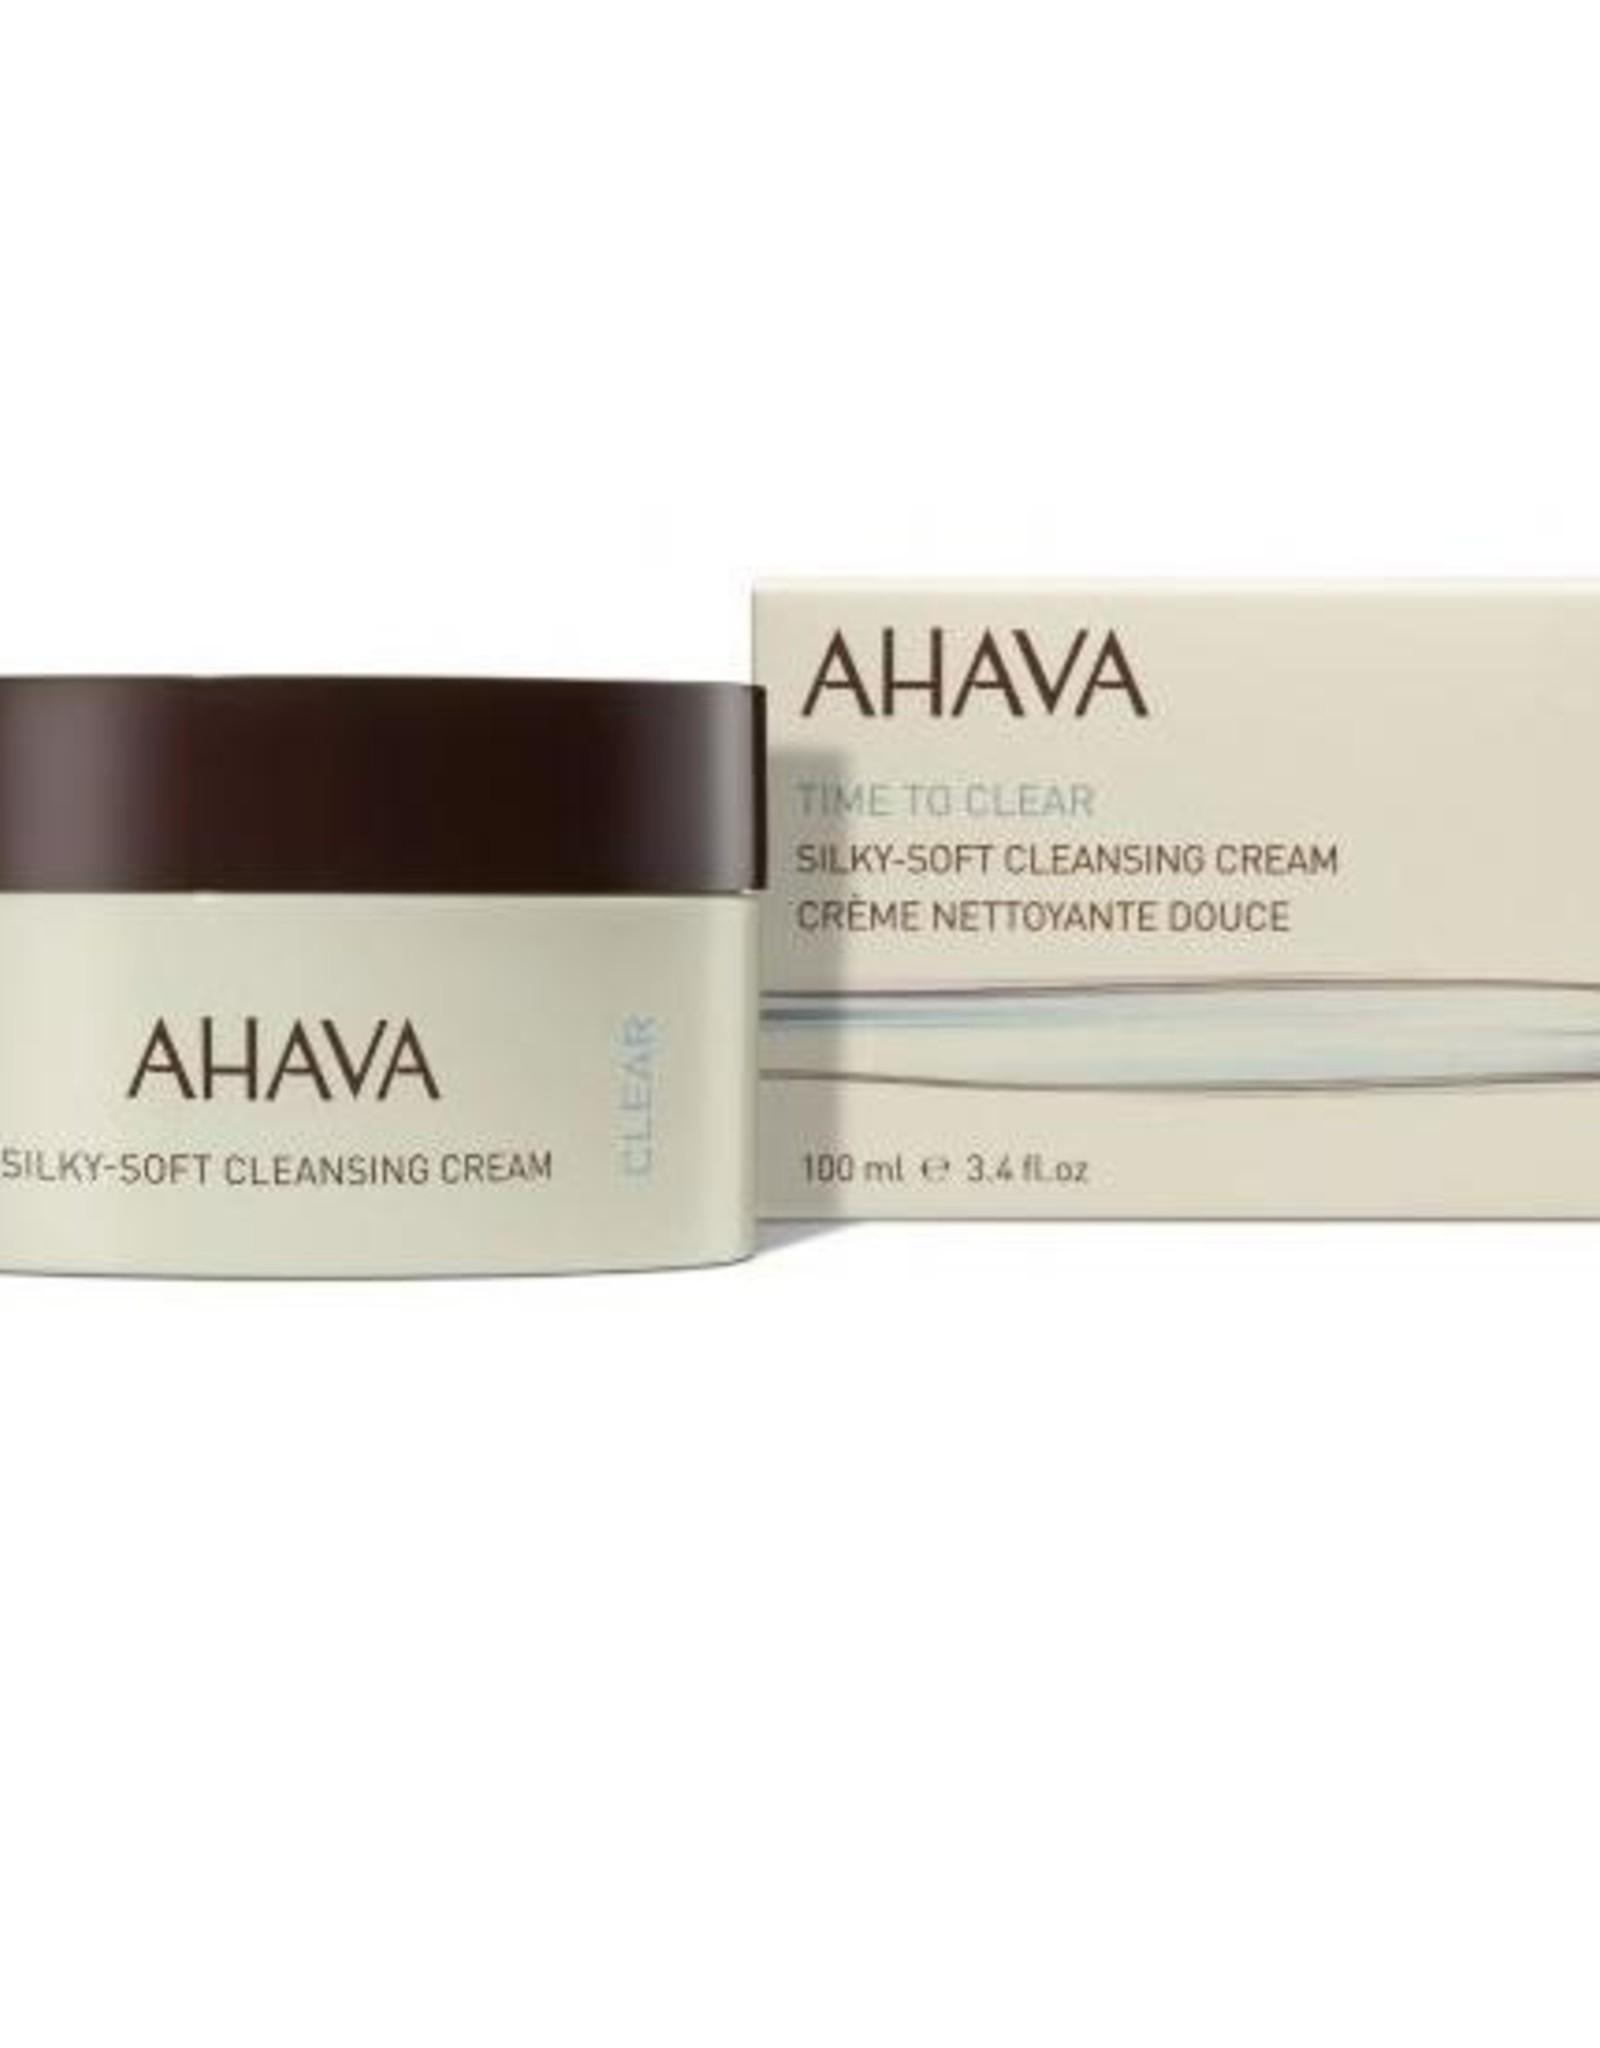 AHAVA Silky soft cleansing cream 100ml